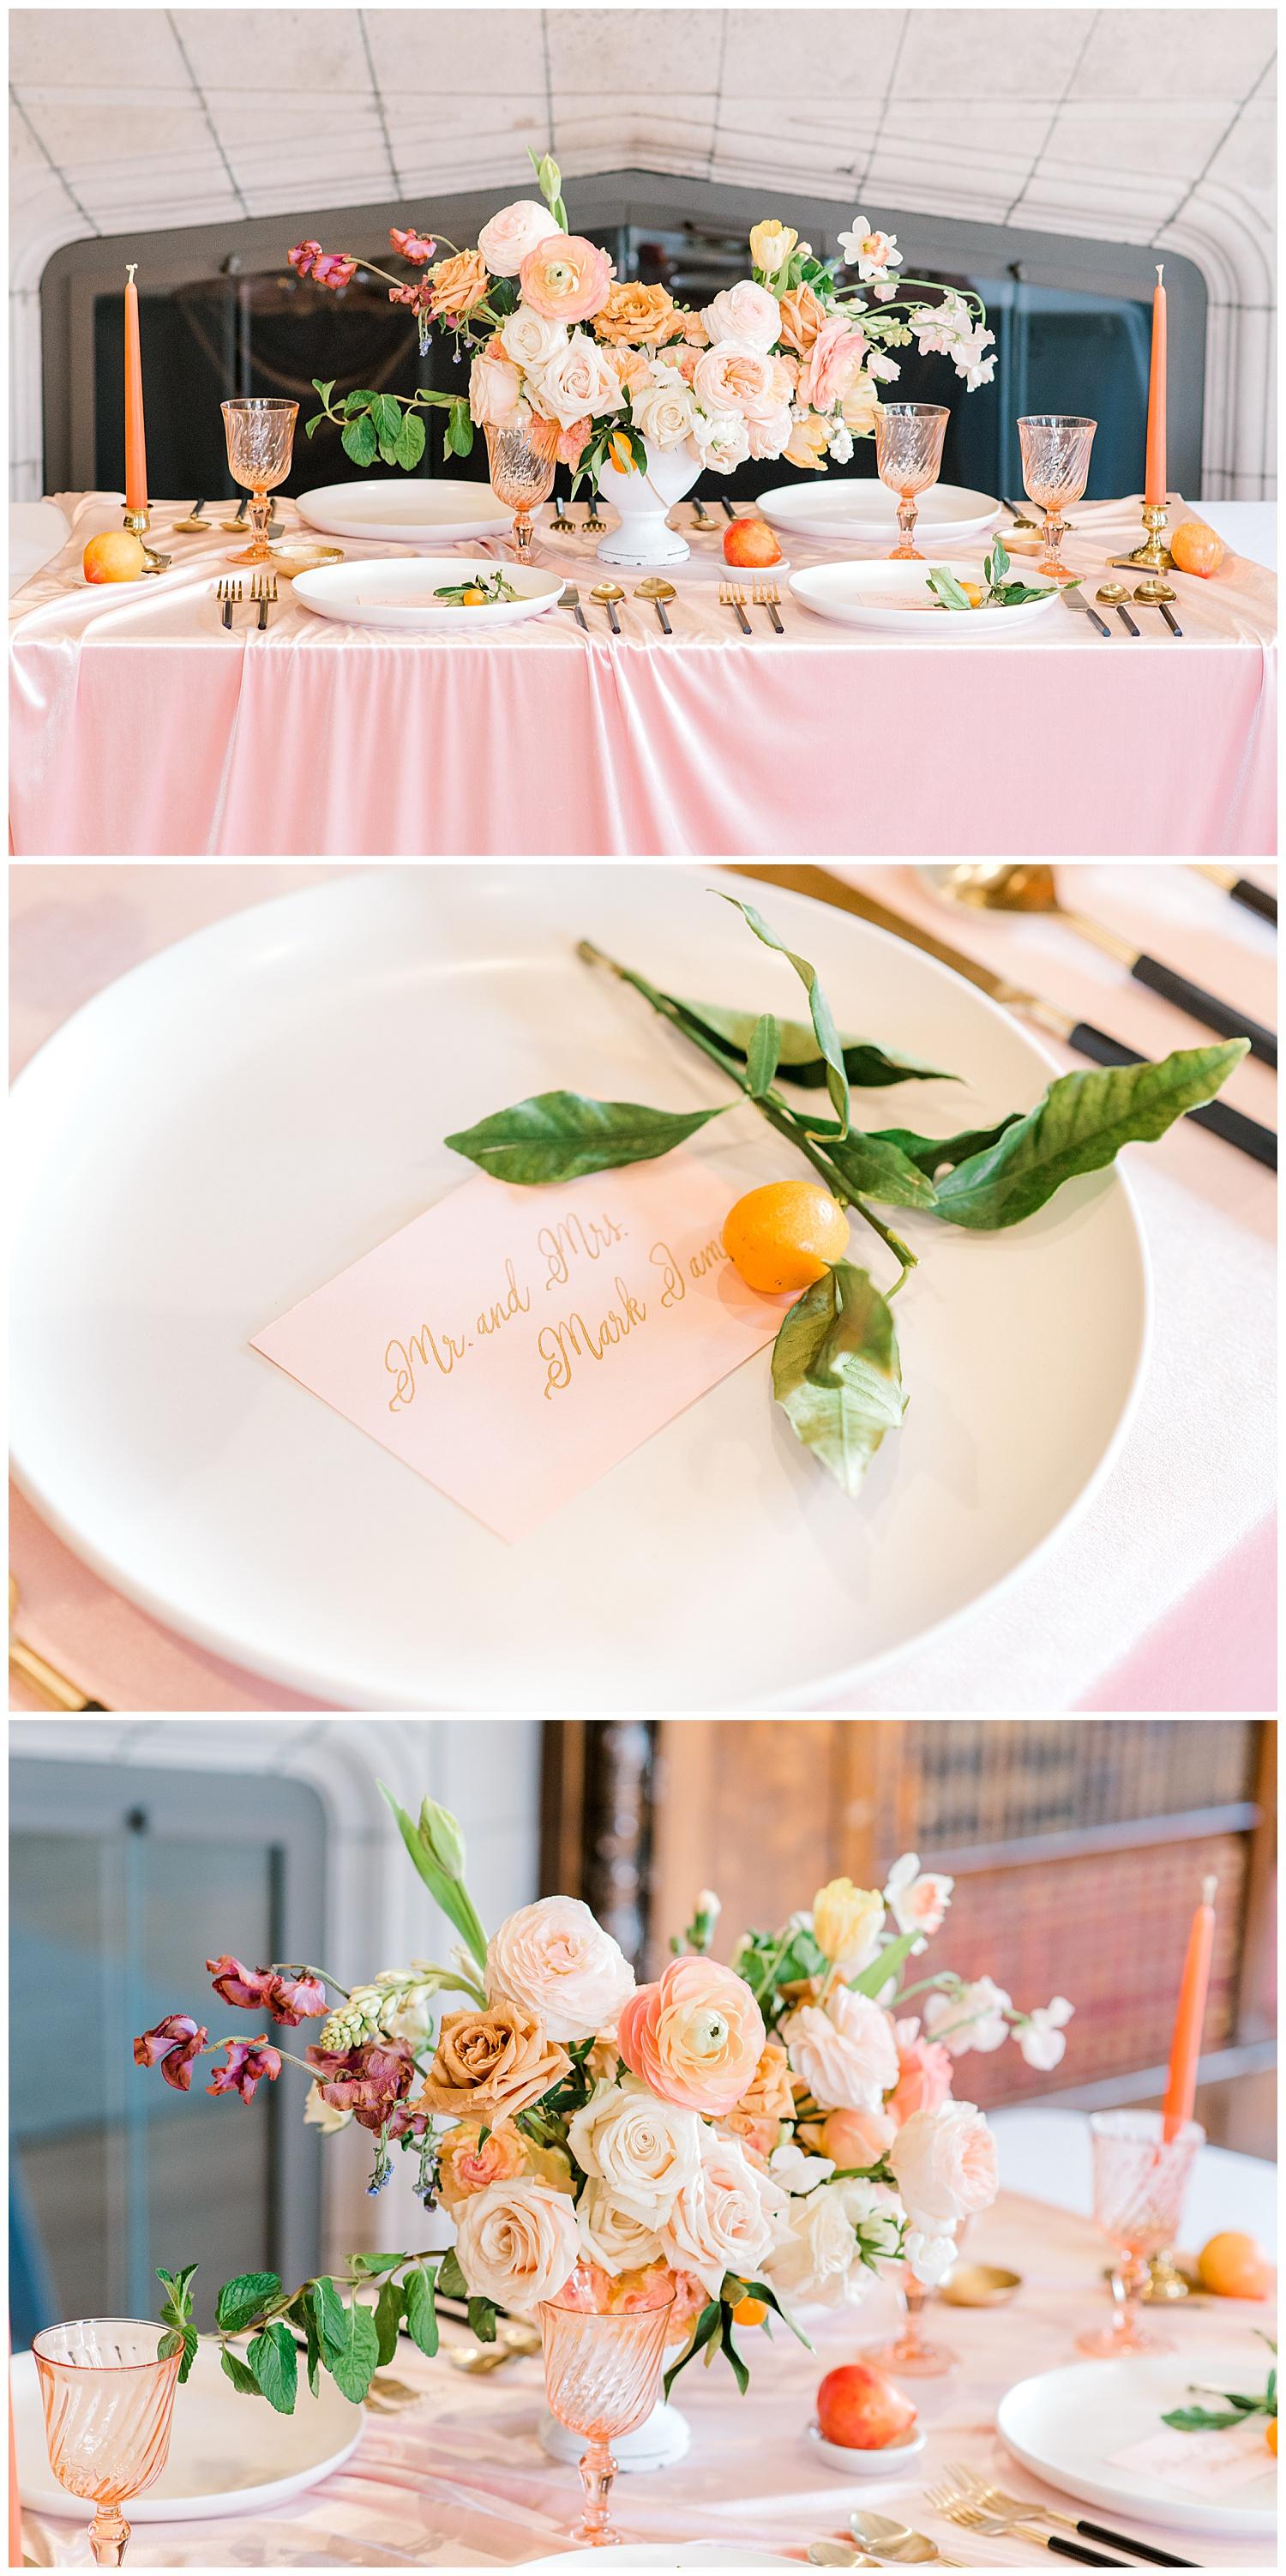 march19-wedding-boston-connors-center-wedding-photography-1.jpg